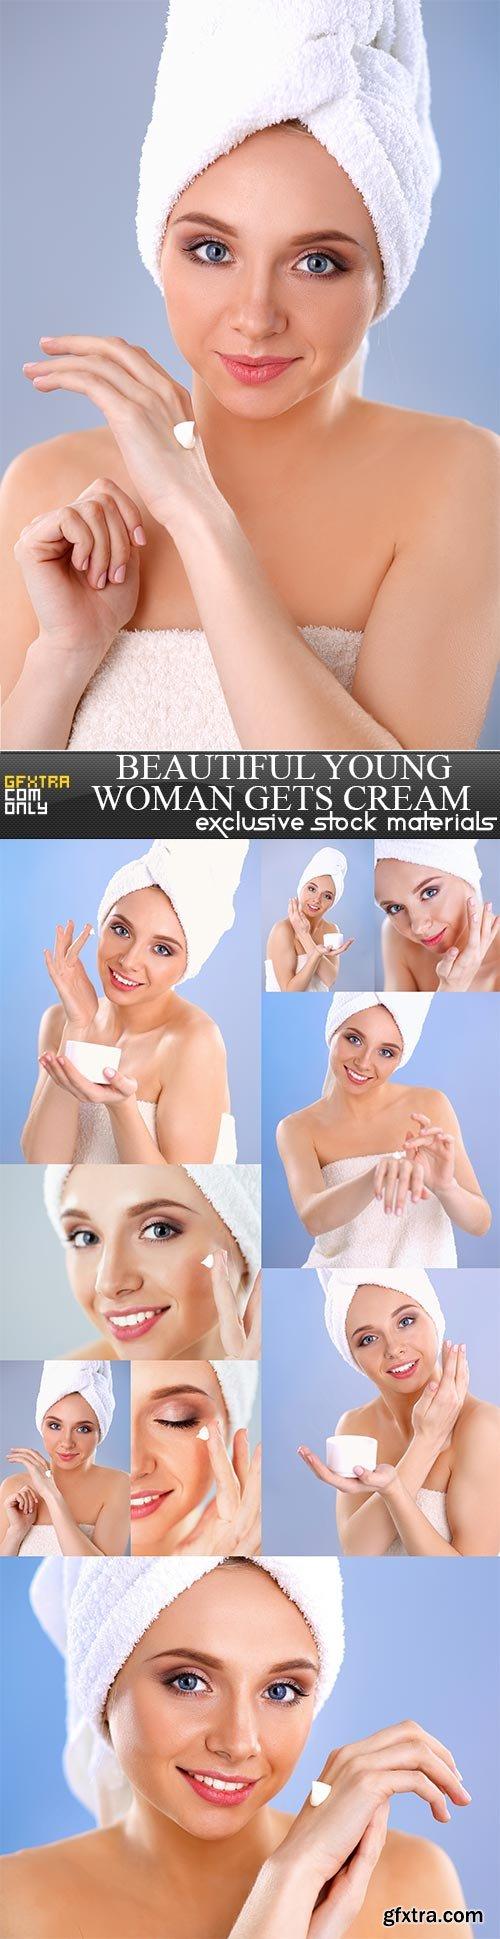 Beautiful young woman gets cream, 9  x  UHQ JPEG